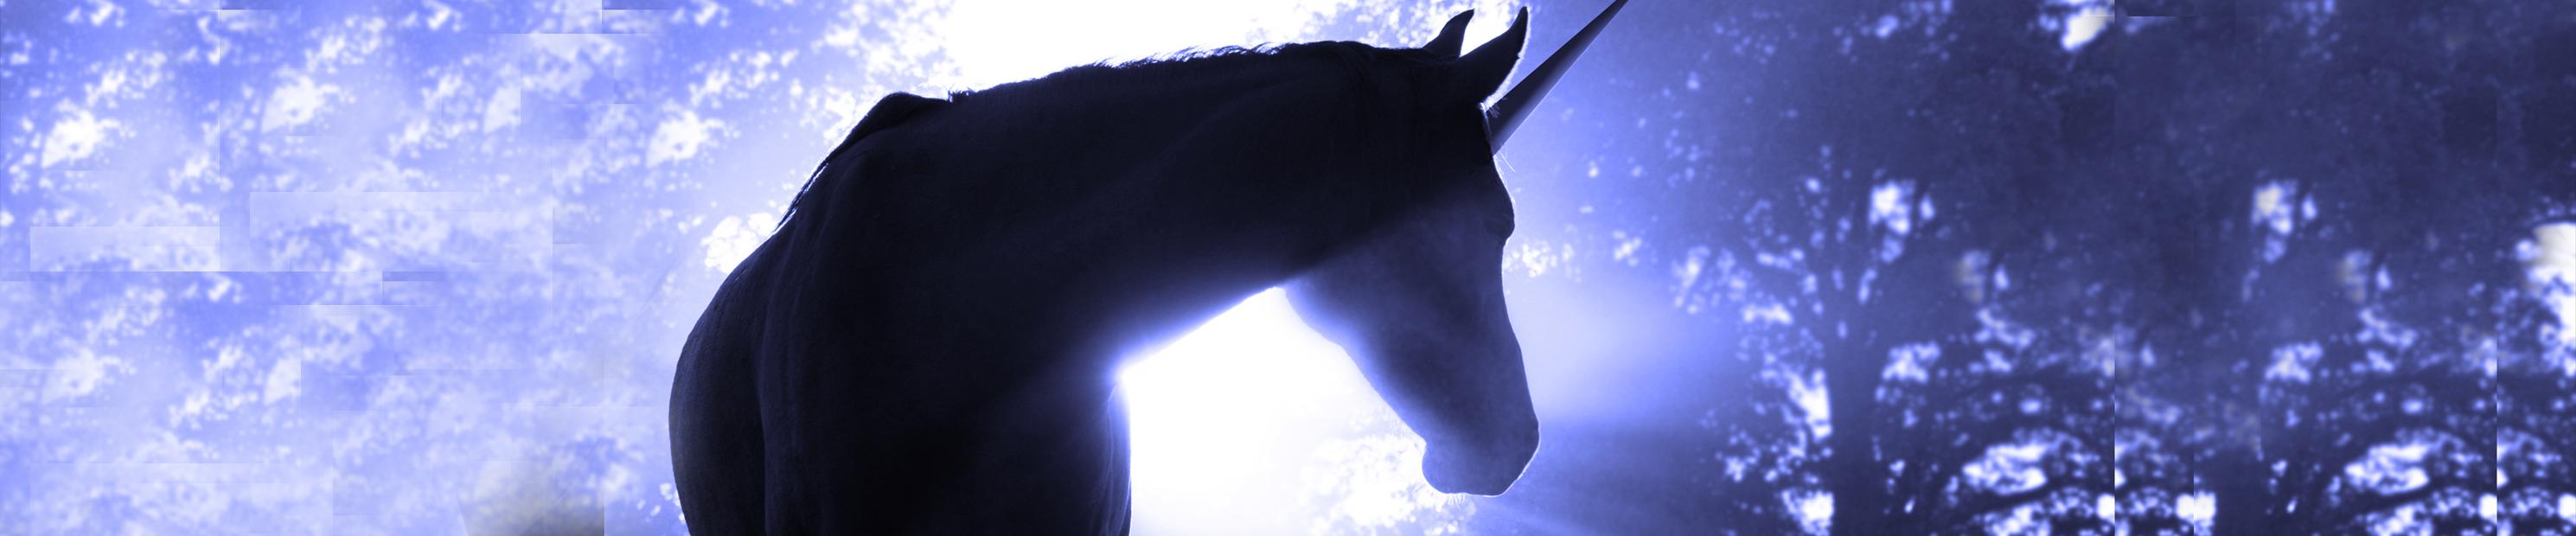 Unicorn_Banner.png